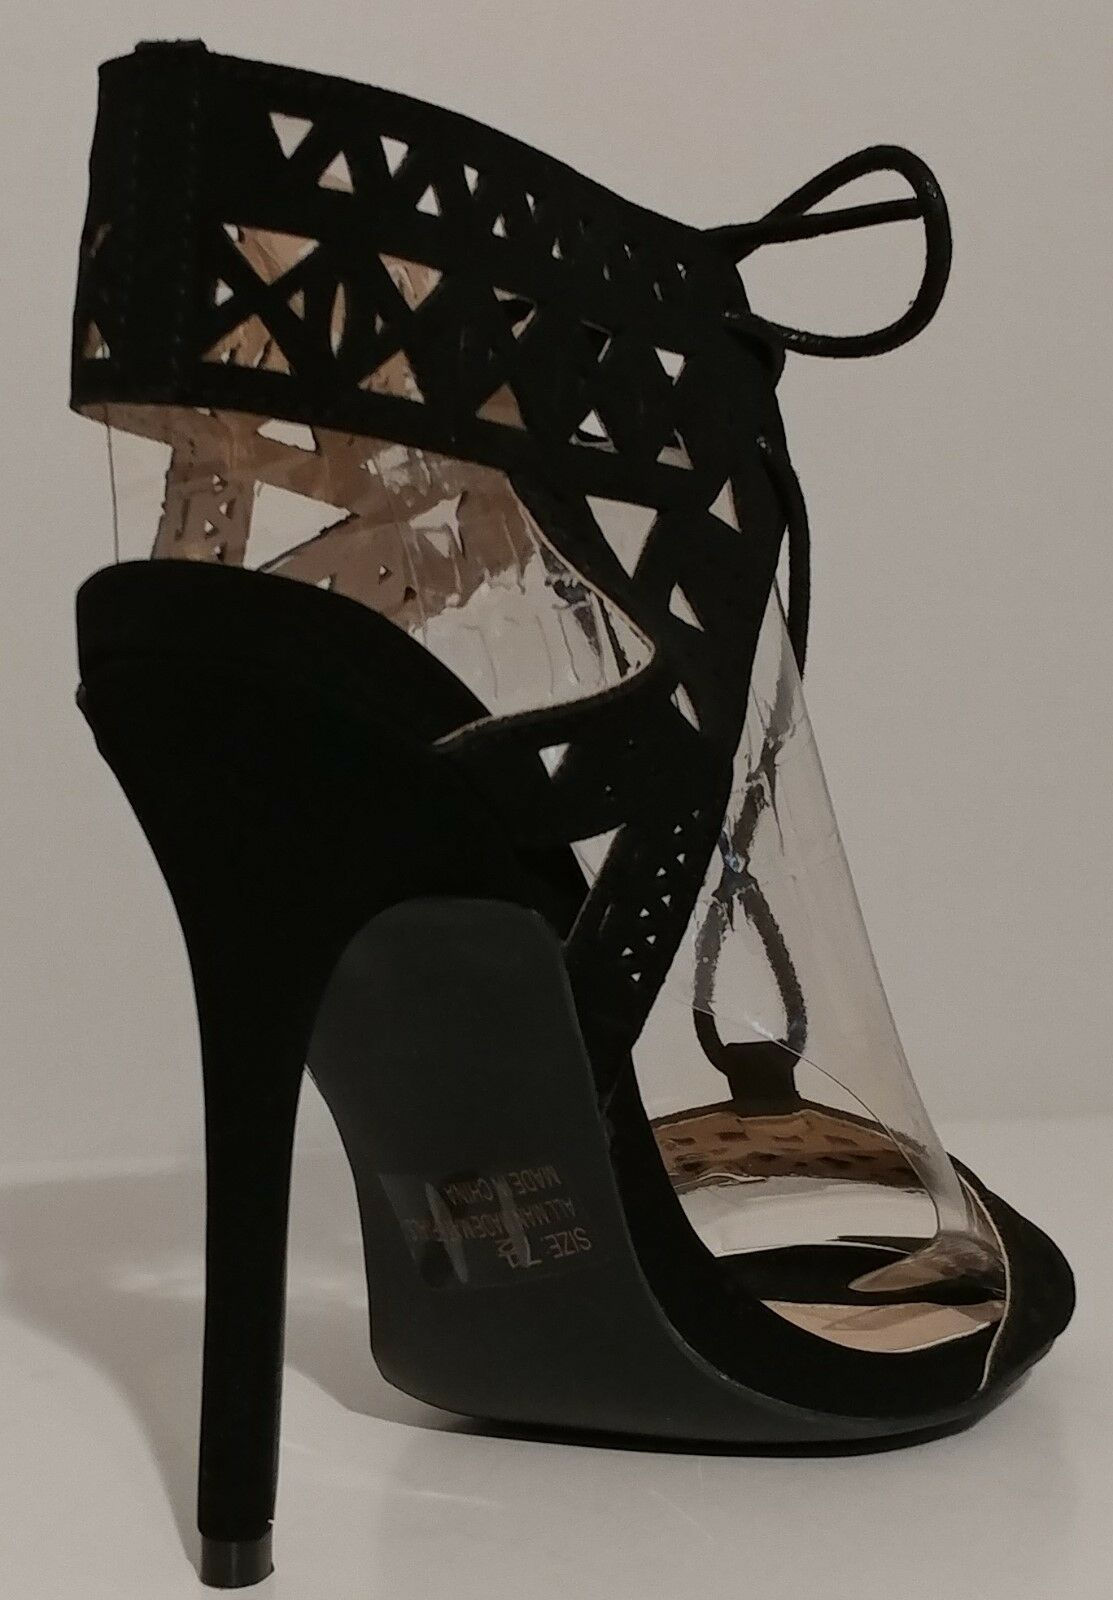 NEW     Qupid Black Suede Sandals 5  Heels Size 7.5M US 37.5M EUR 0defdd